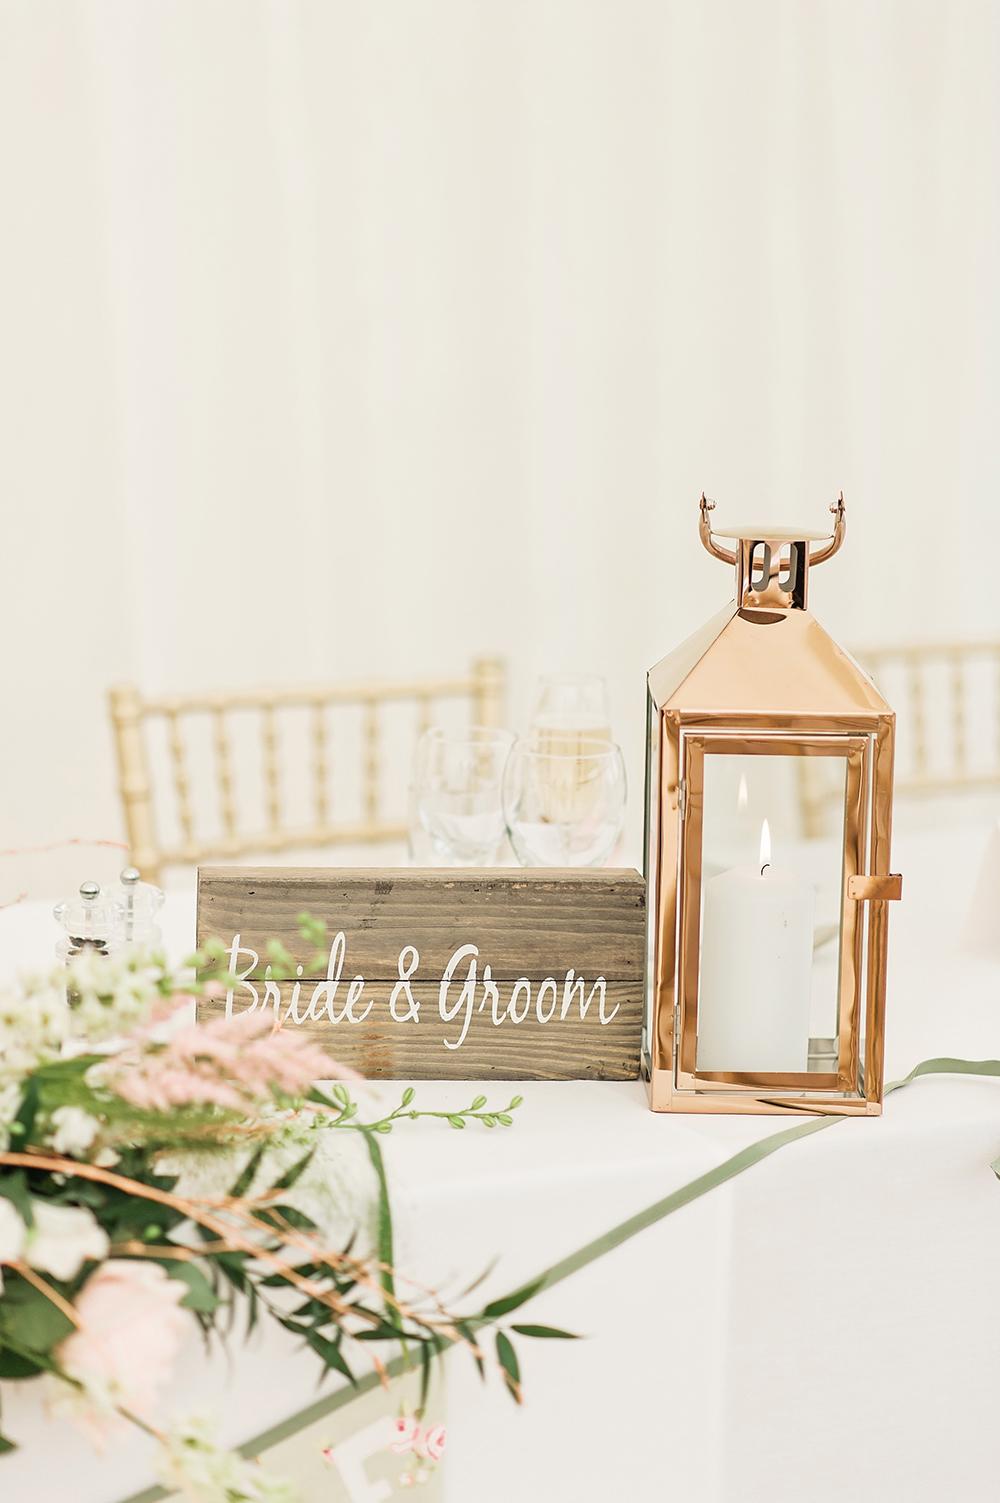 Bride & Groom Sign Wooden Sign Storm Lantern Edmondsham House Wedding Darima Frampton Photography